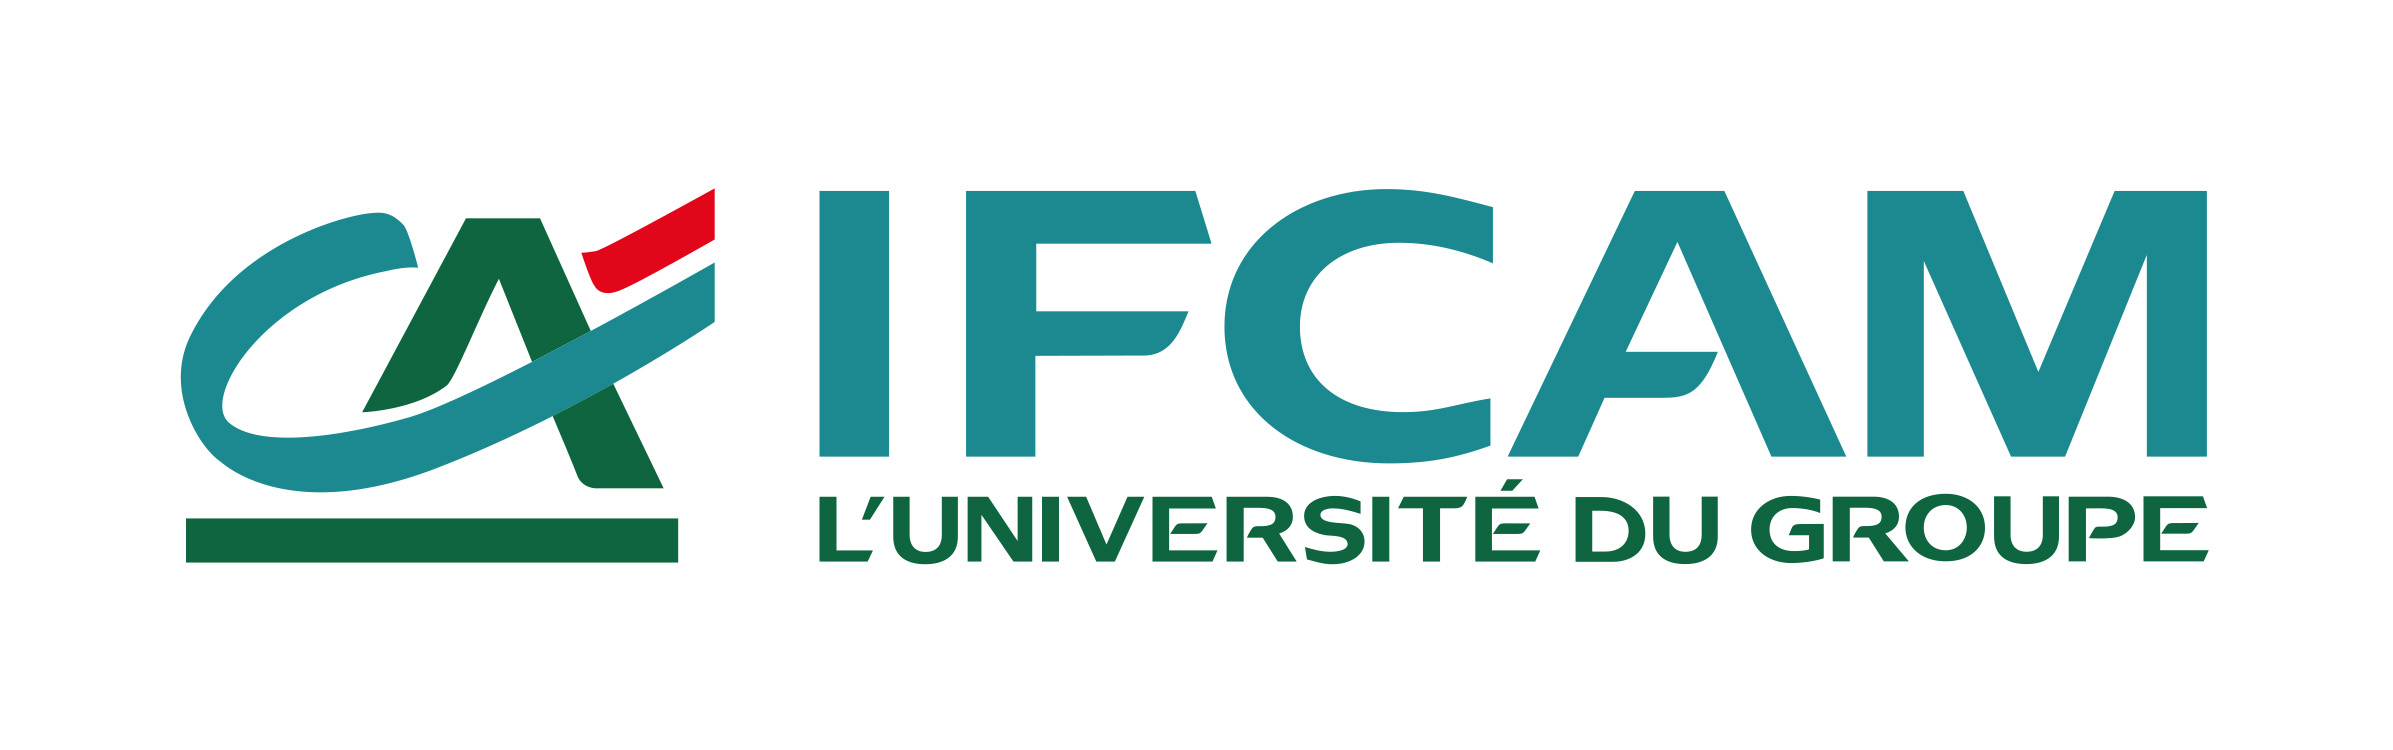 CA-IFCAM-logotype_fond_blanc